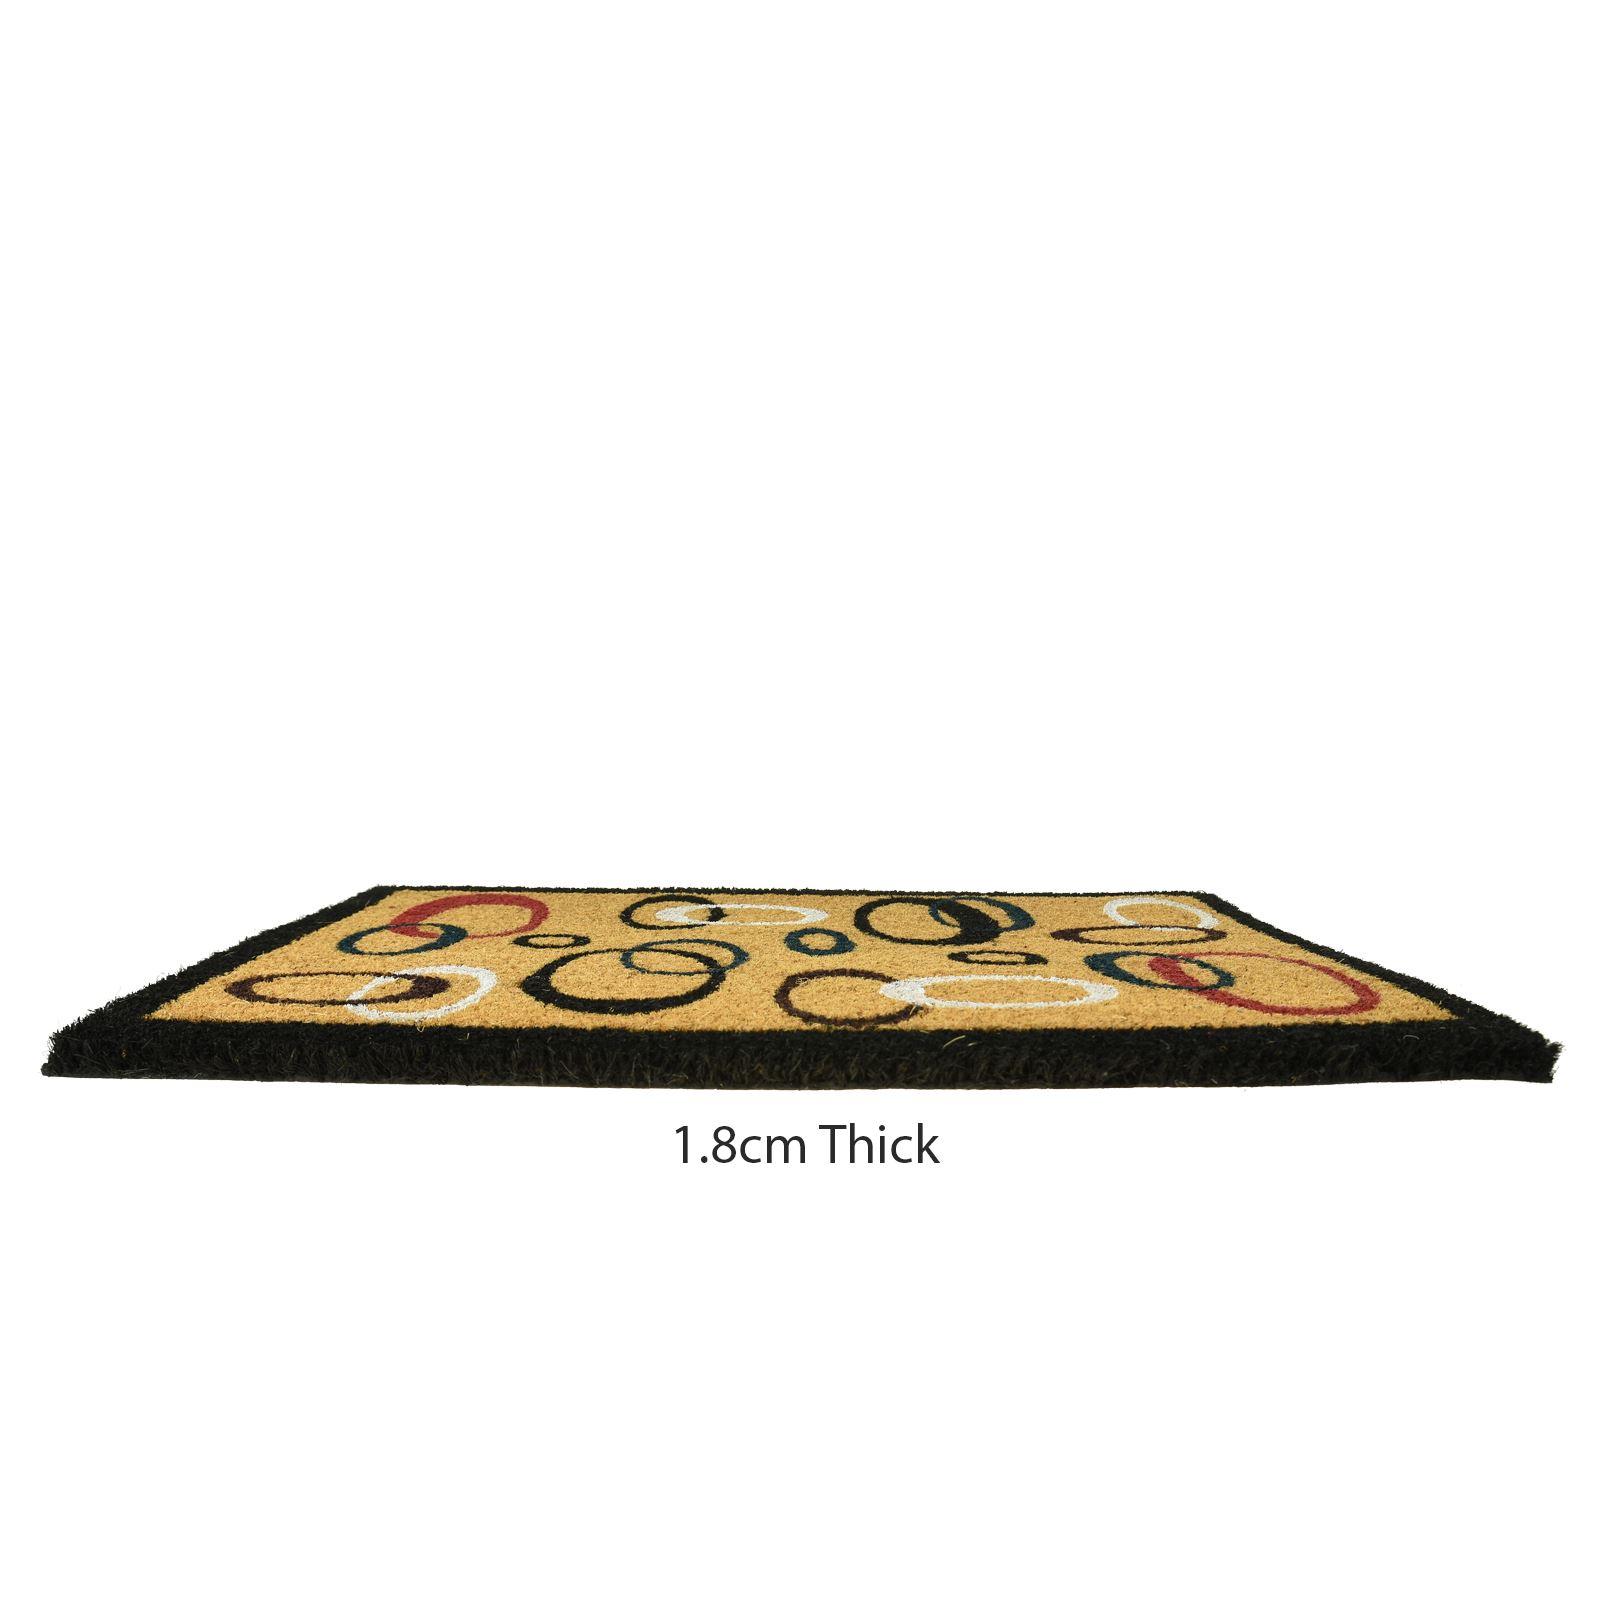 Plain-Non-Slip-Door-Mat-Tough-Natural-Coir-PVC-Back-Welcome-Doormat-40-x-60cm miniatura 33